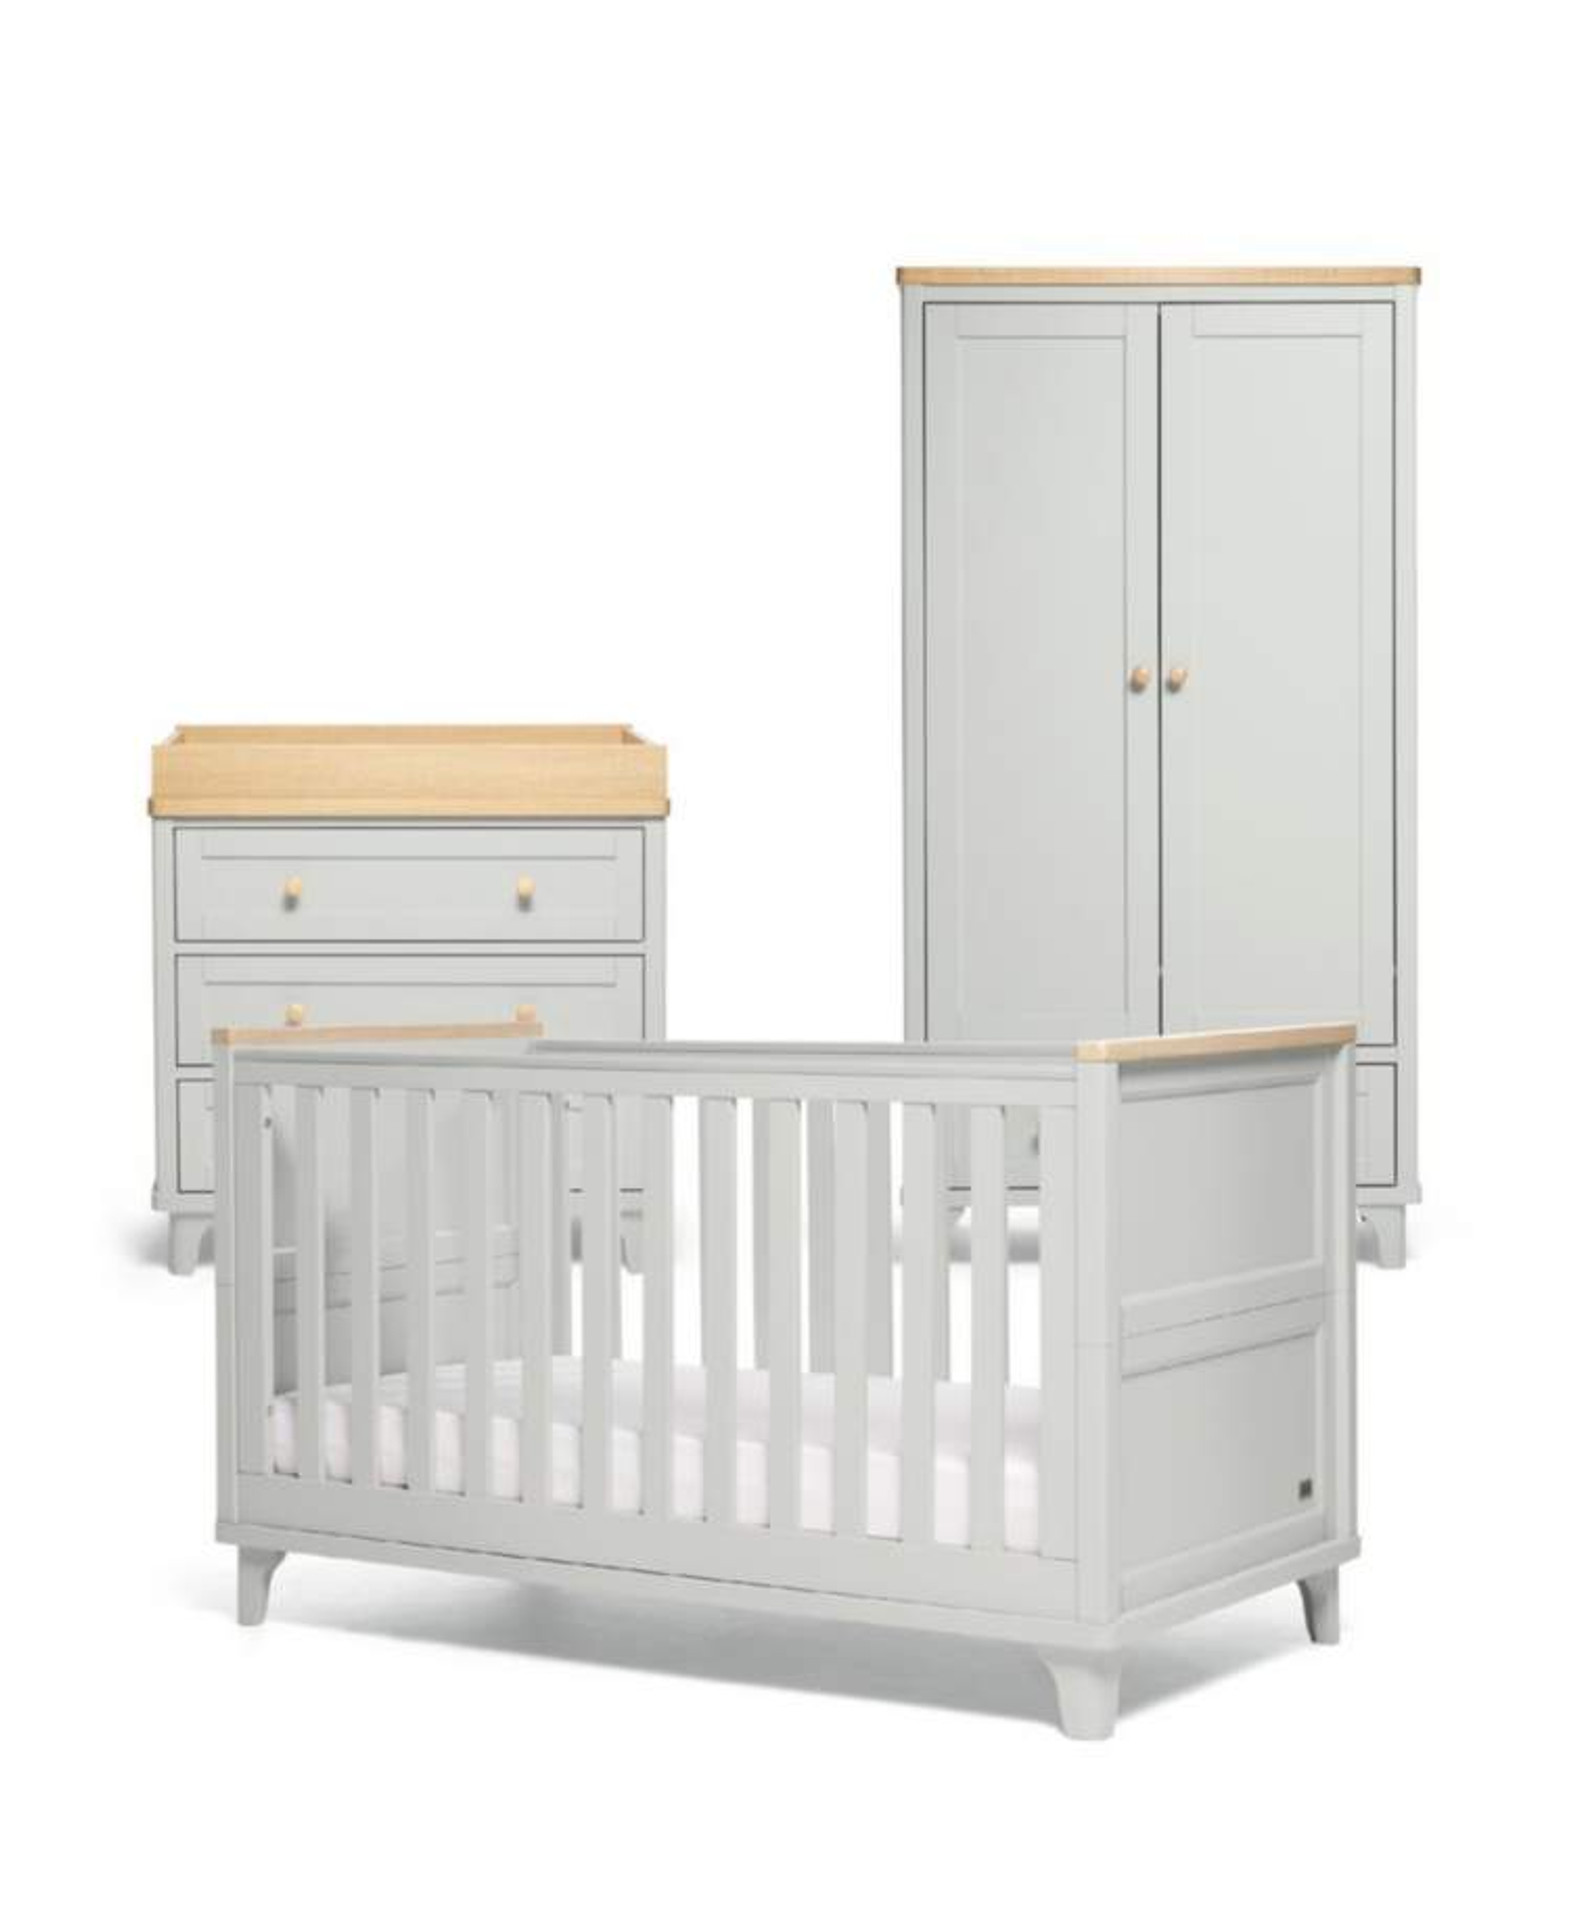 Mamas & Papas Trista 3 Piece Cot bed Range - Grey/Oak